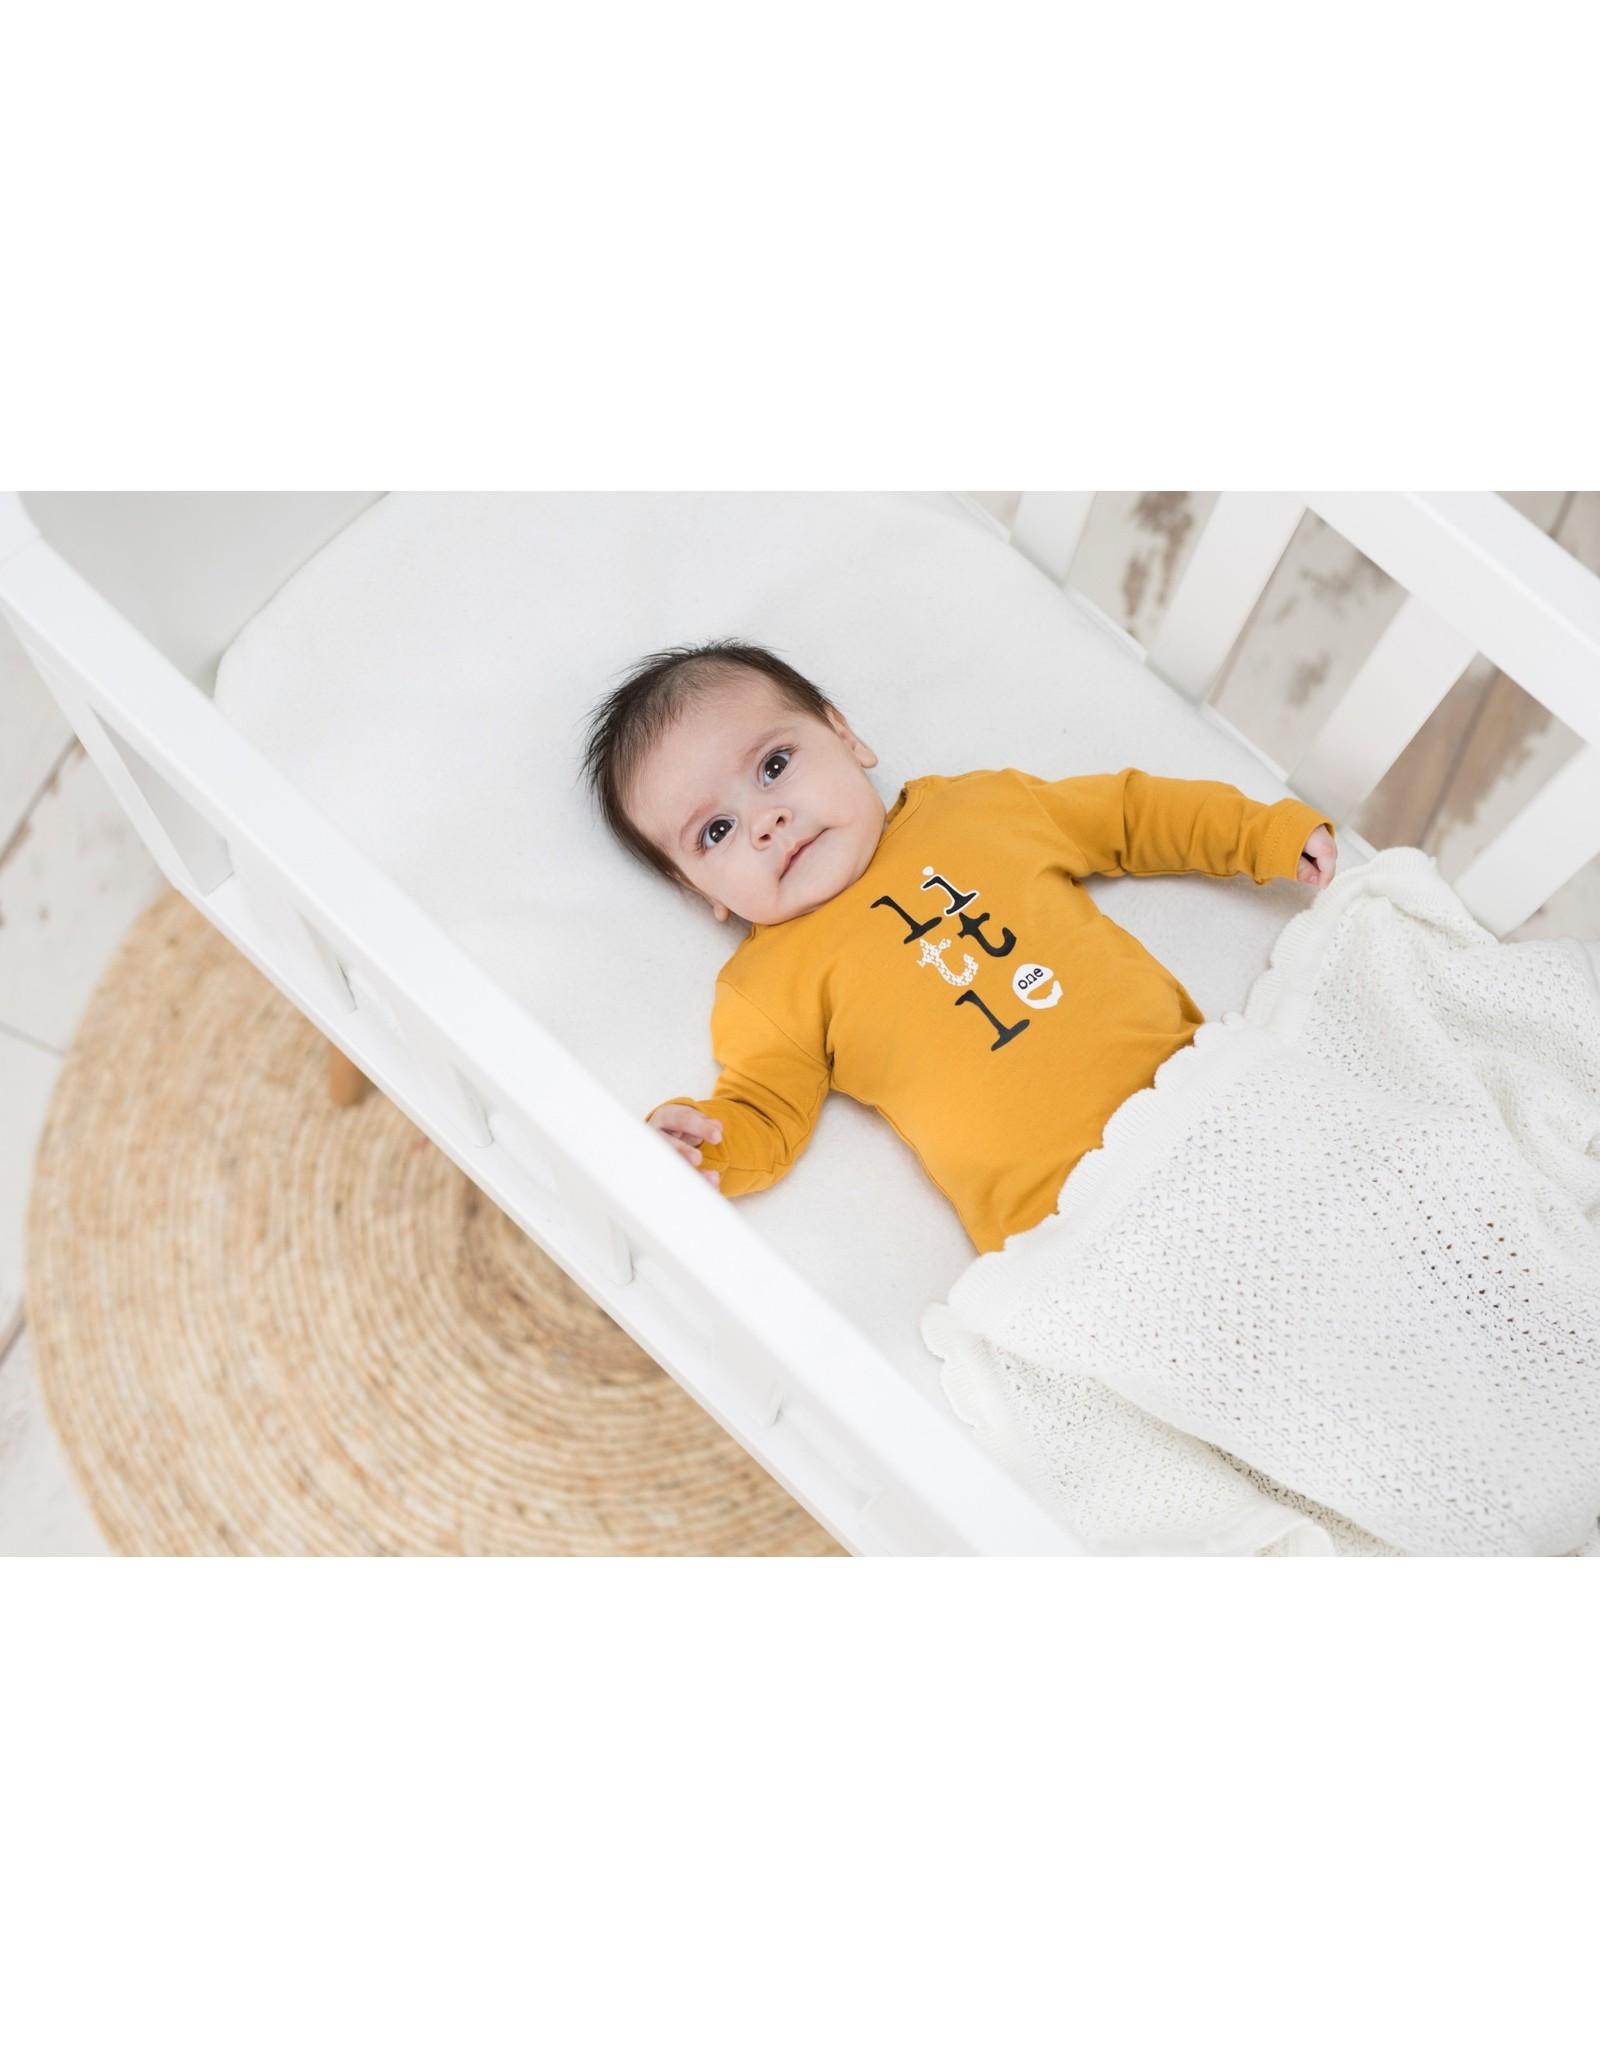 Bampidano Bampidano New Born jongens shirt Brandon Free Hugs Ocre Yellow